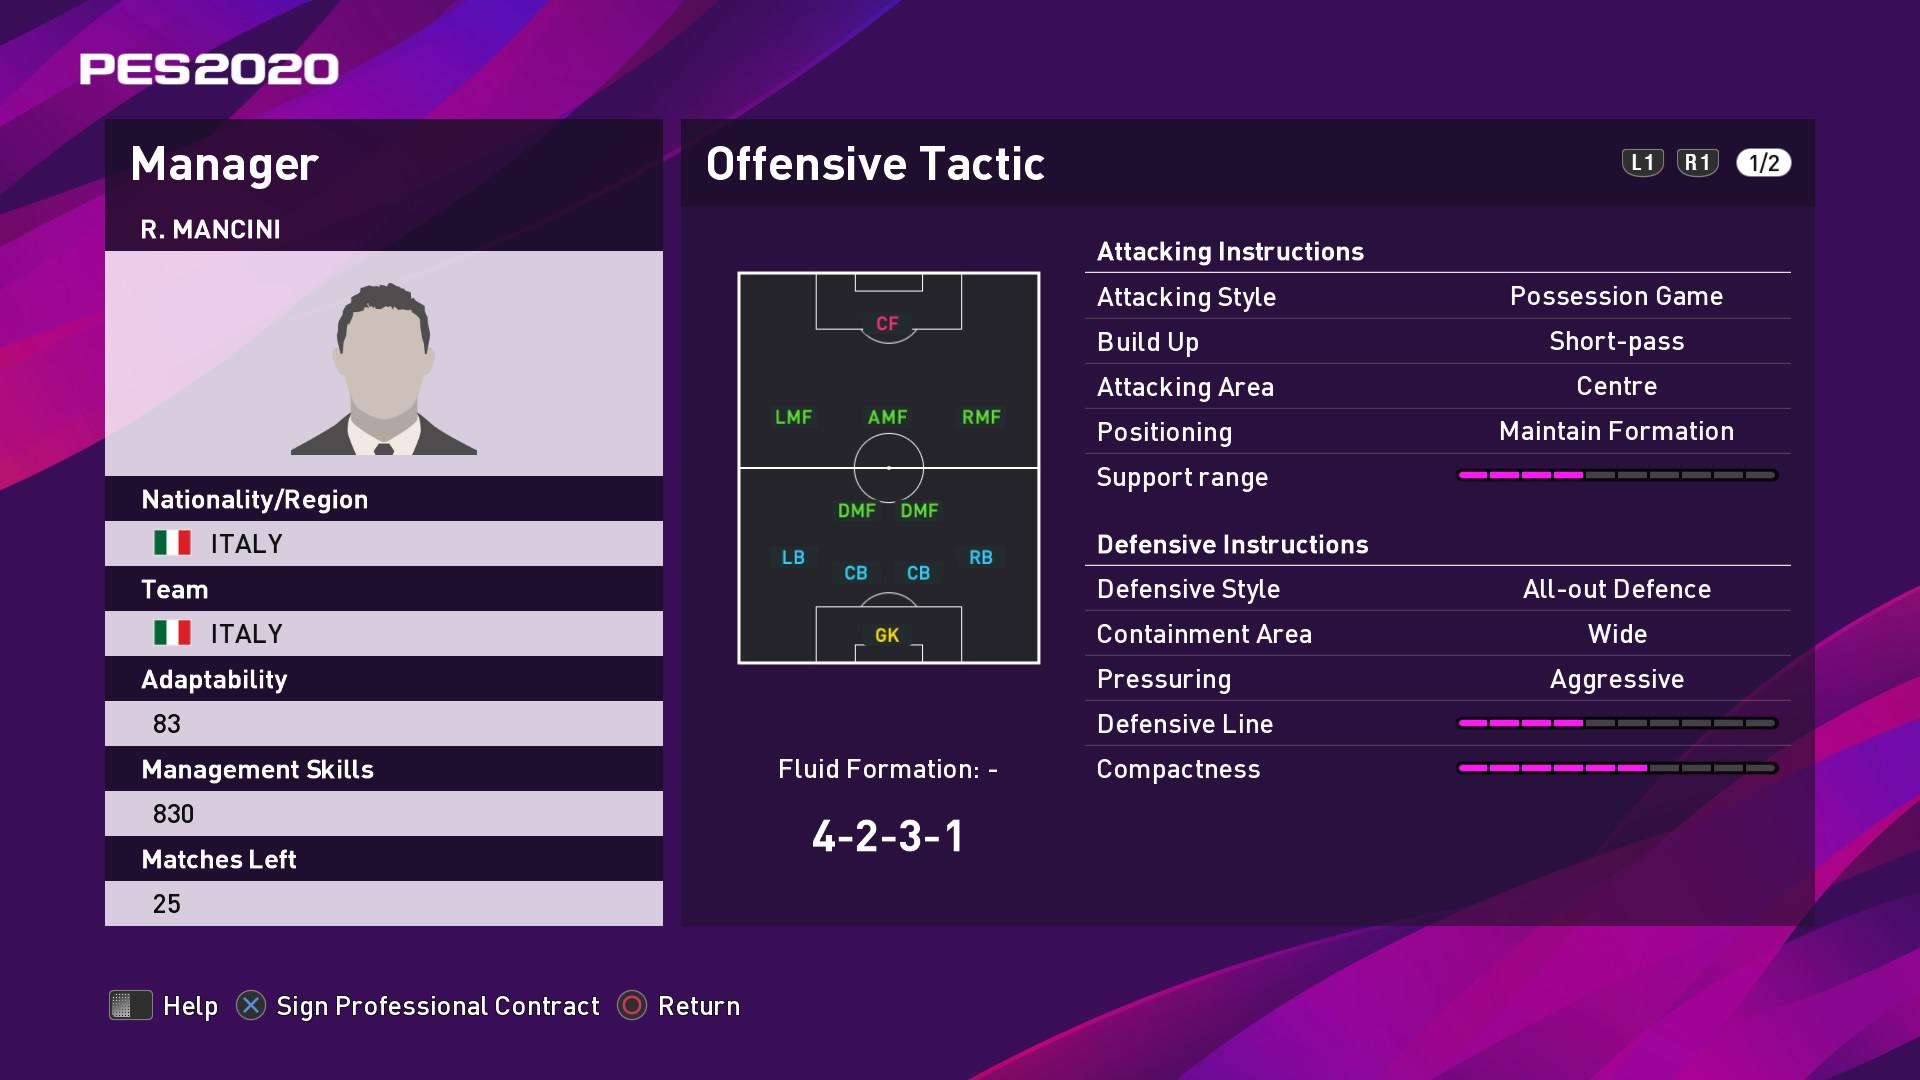 R. Mancini (Roberto Macini) Offensive Tactic in PES 2020 myClub